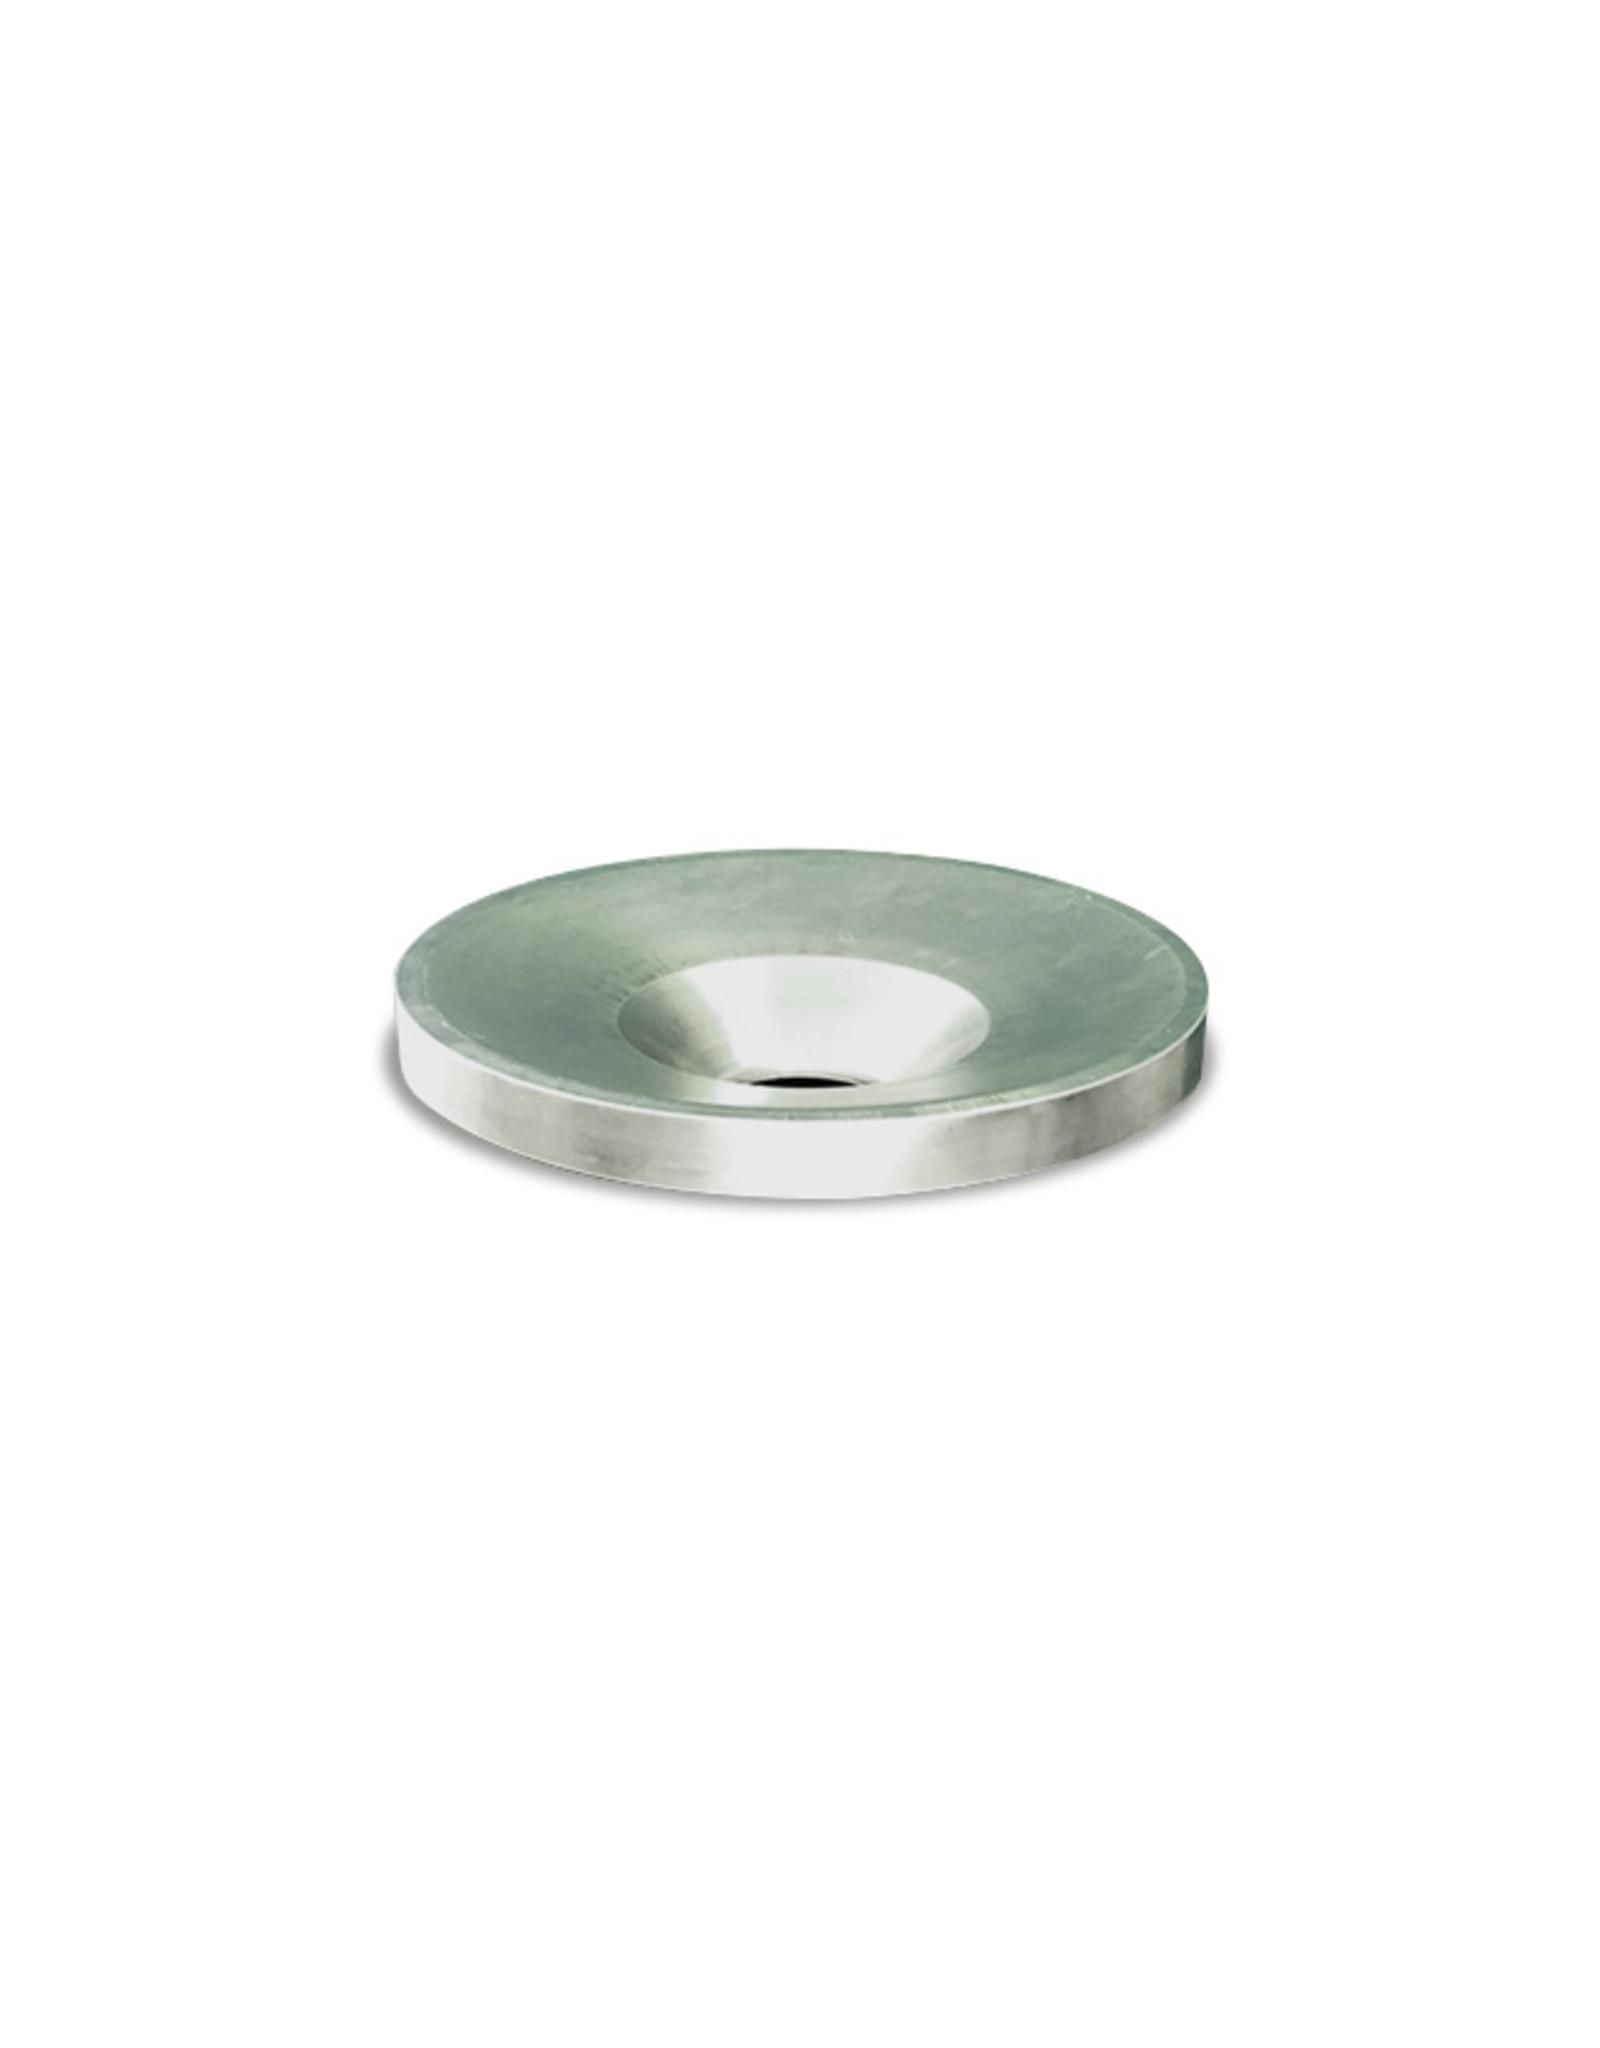 BinBin Flame-retardant lid for a 200L drum-Bin